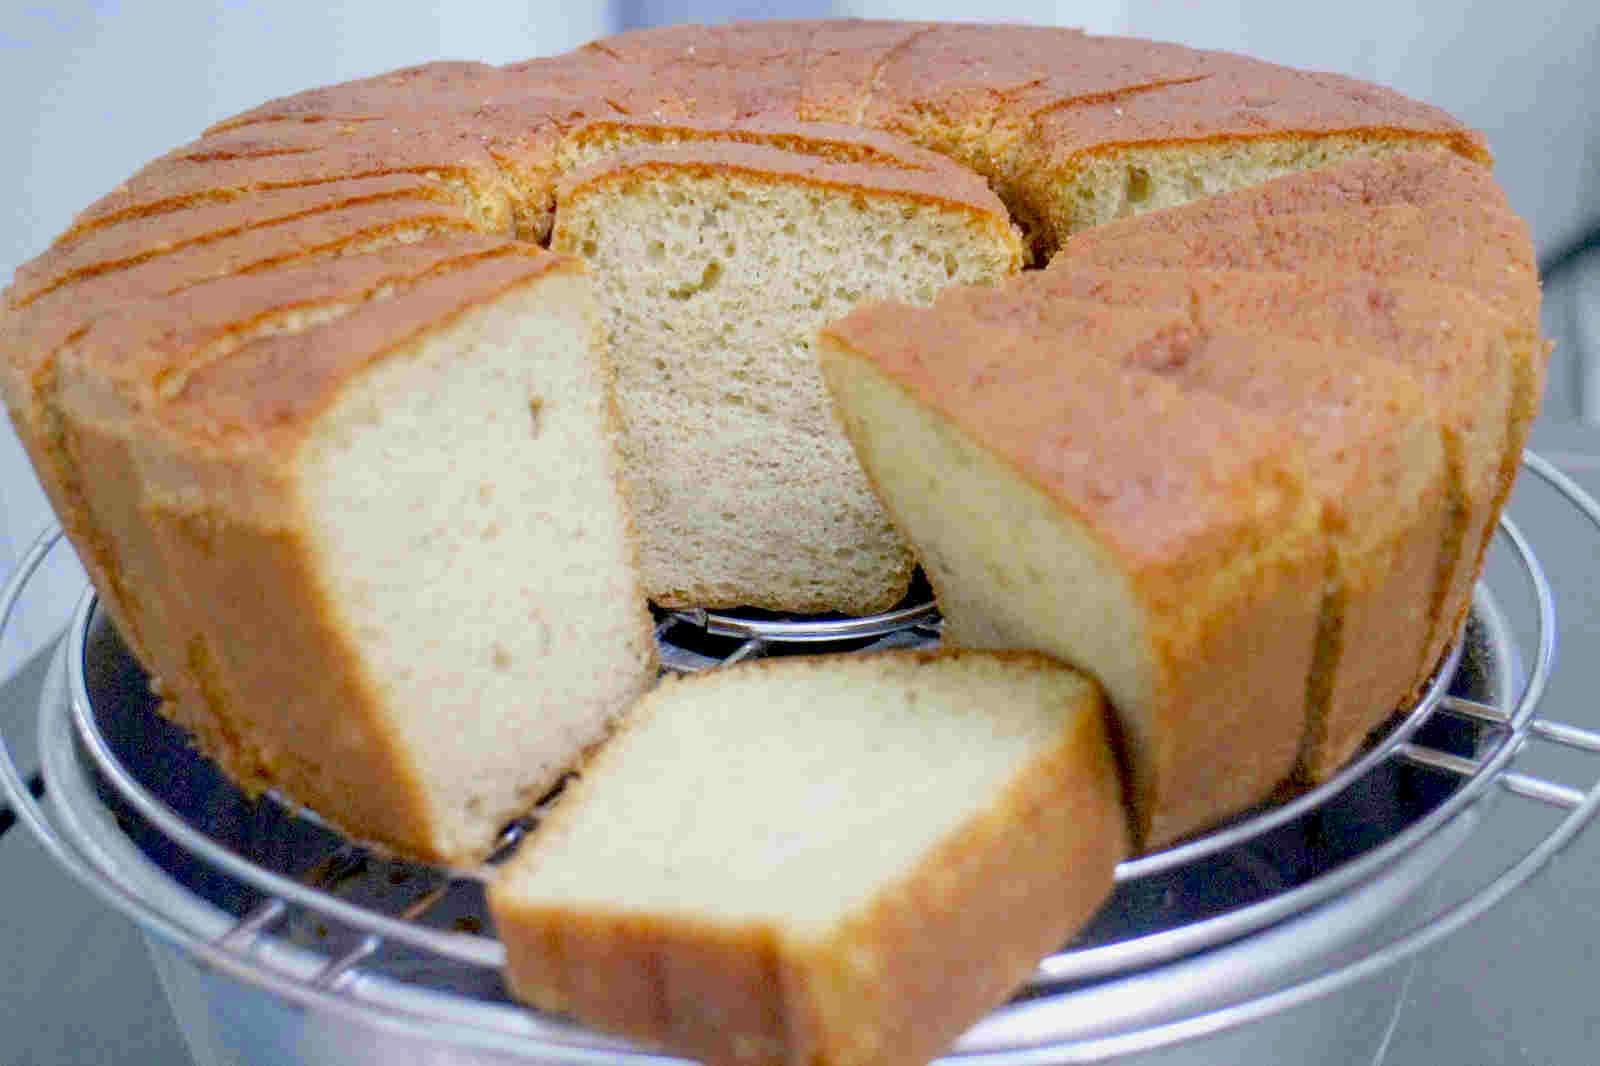 Resep Cake Kukus Enak: Cara Membuat Bolu Kukus Lembut Dan Enak